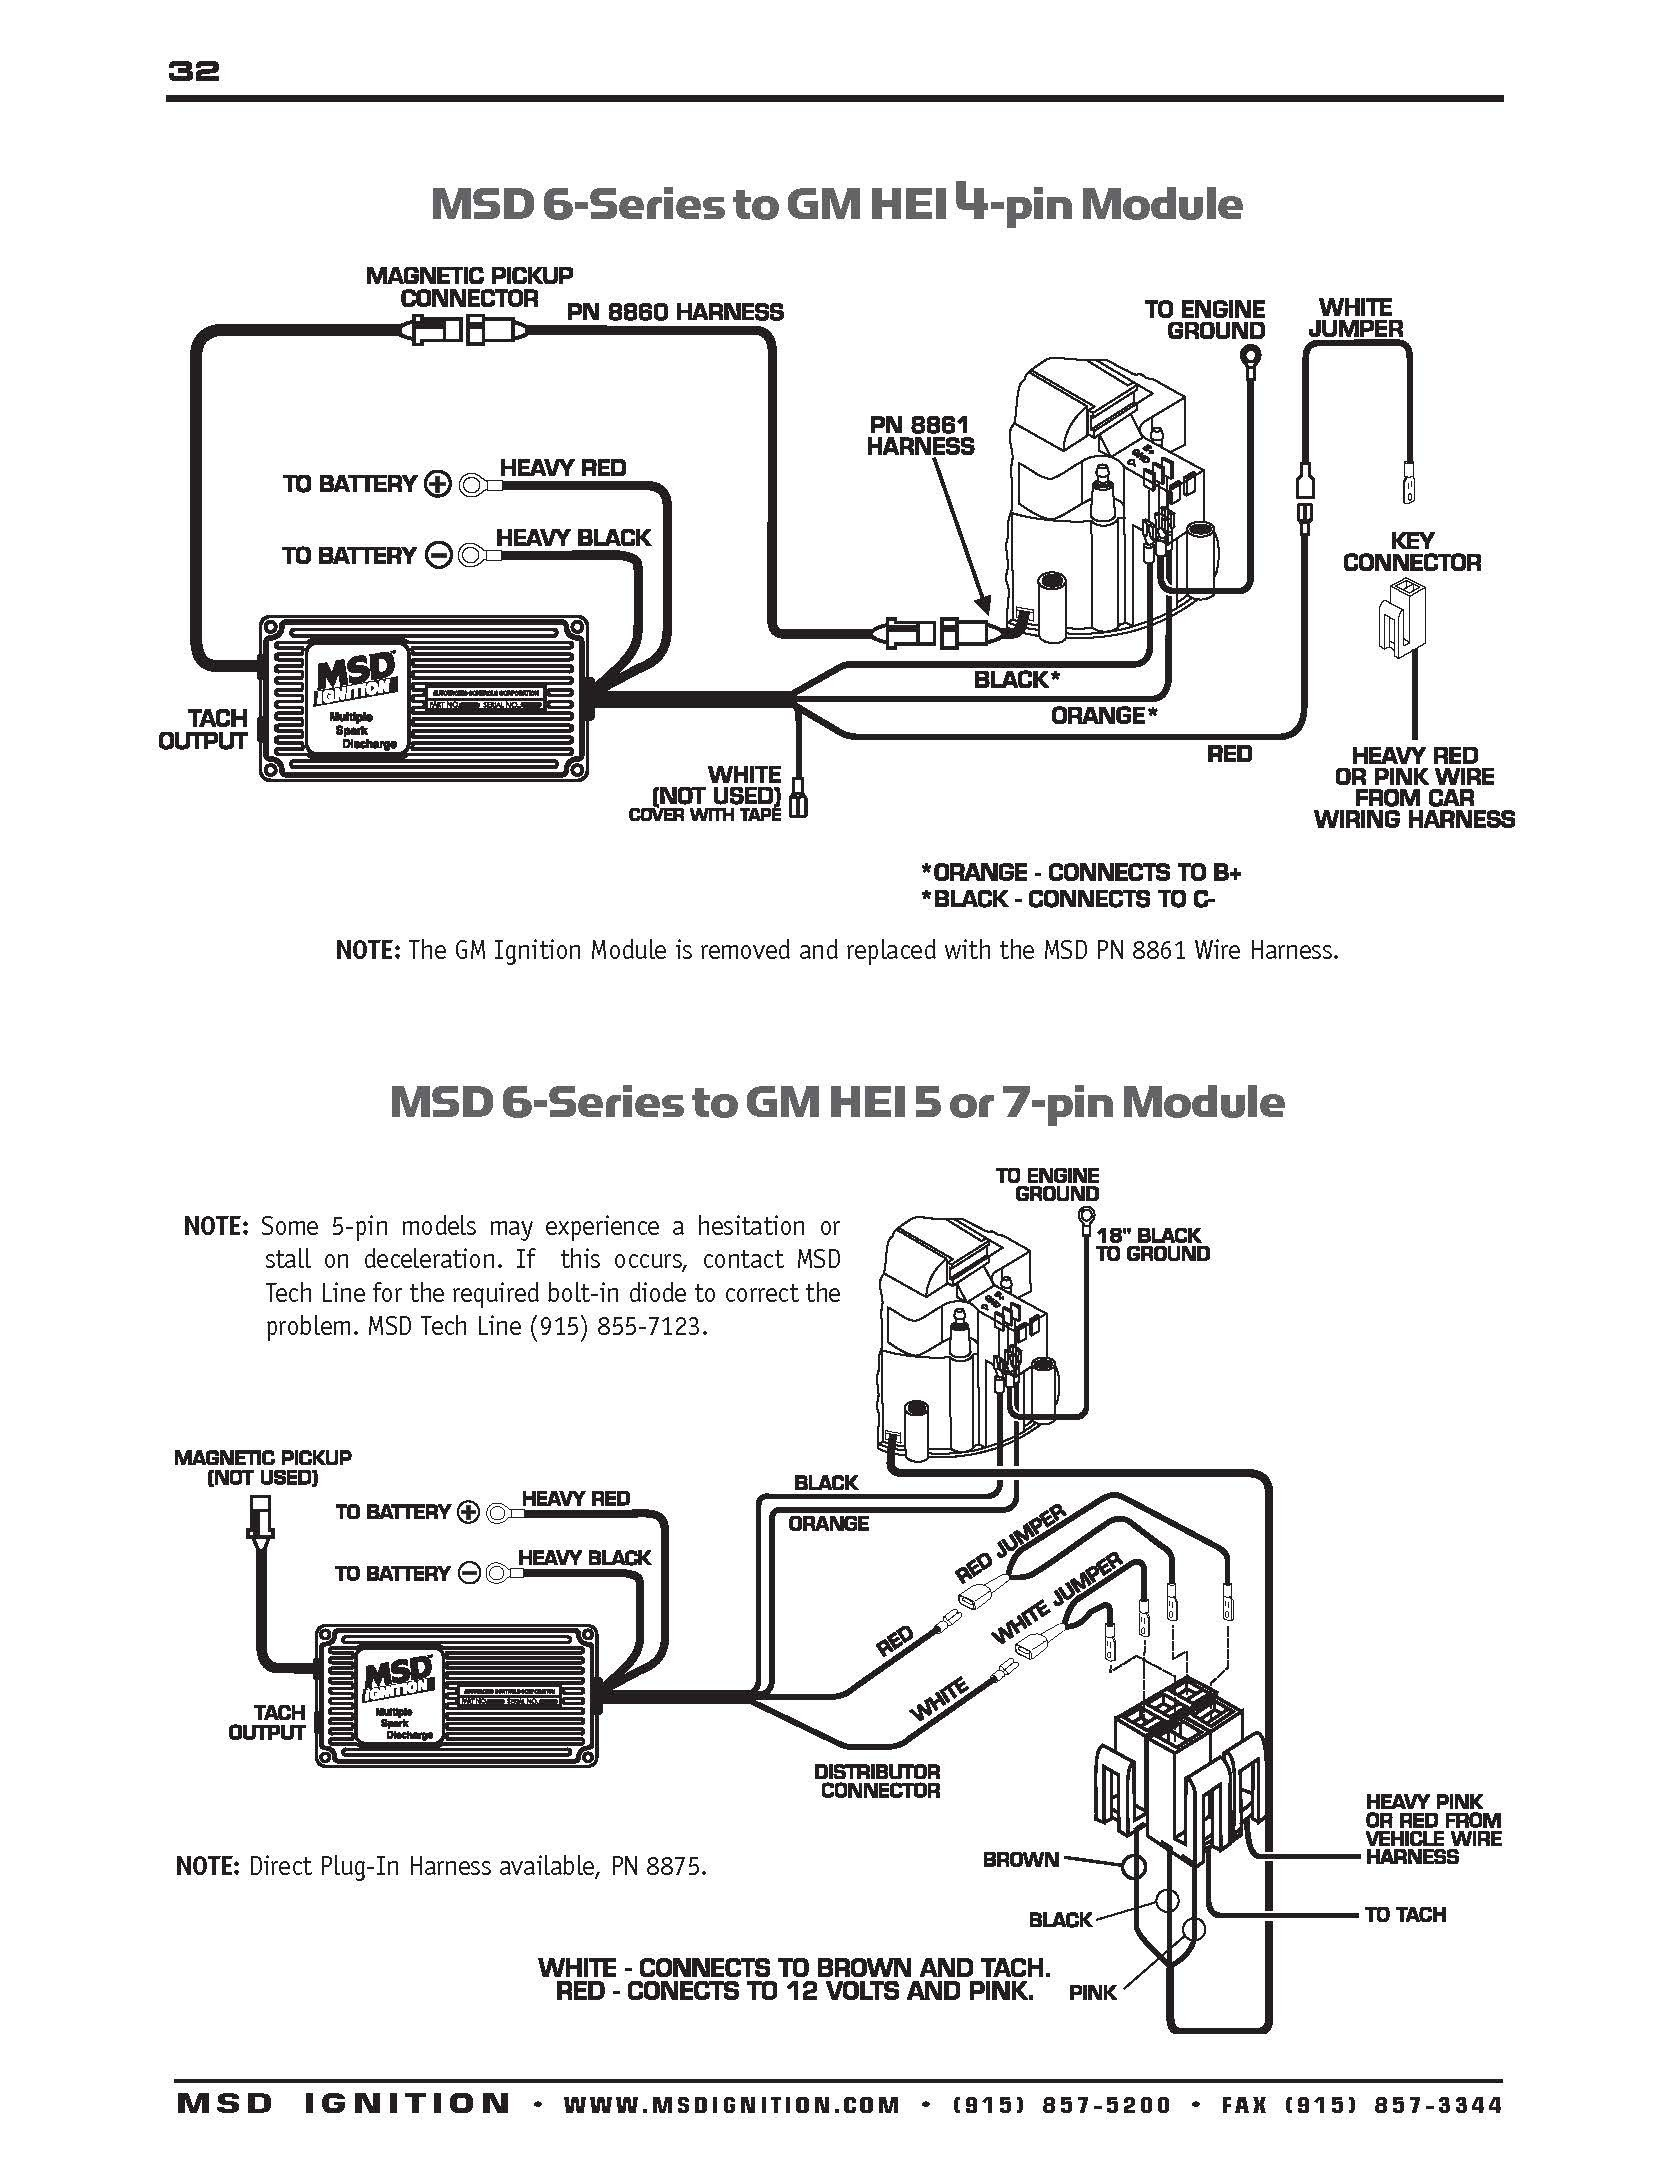 Mallory Ignition Tach Wiring Diagram Allison Transmission 2000 Wiring Diagram 1990 300zx Yenpancane Jeanjaures37 Fr